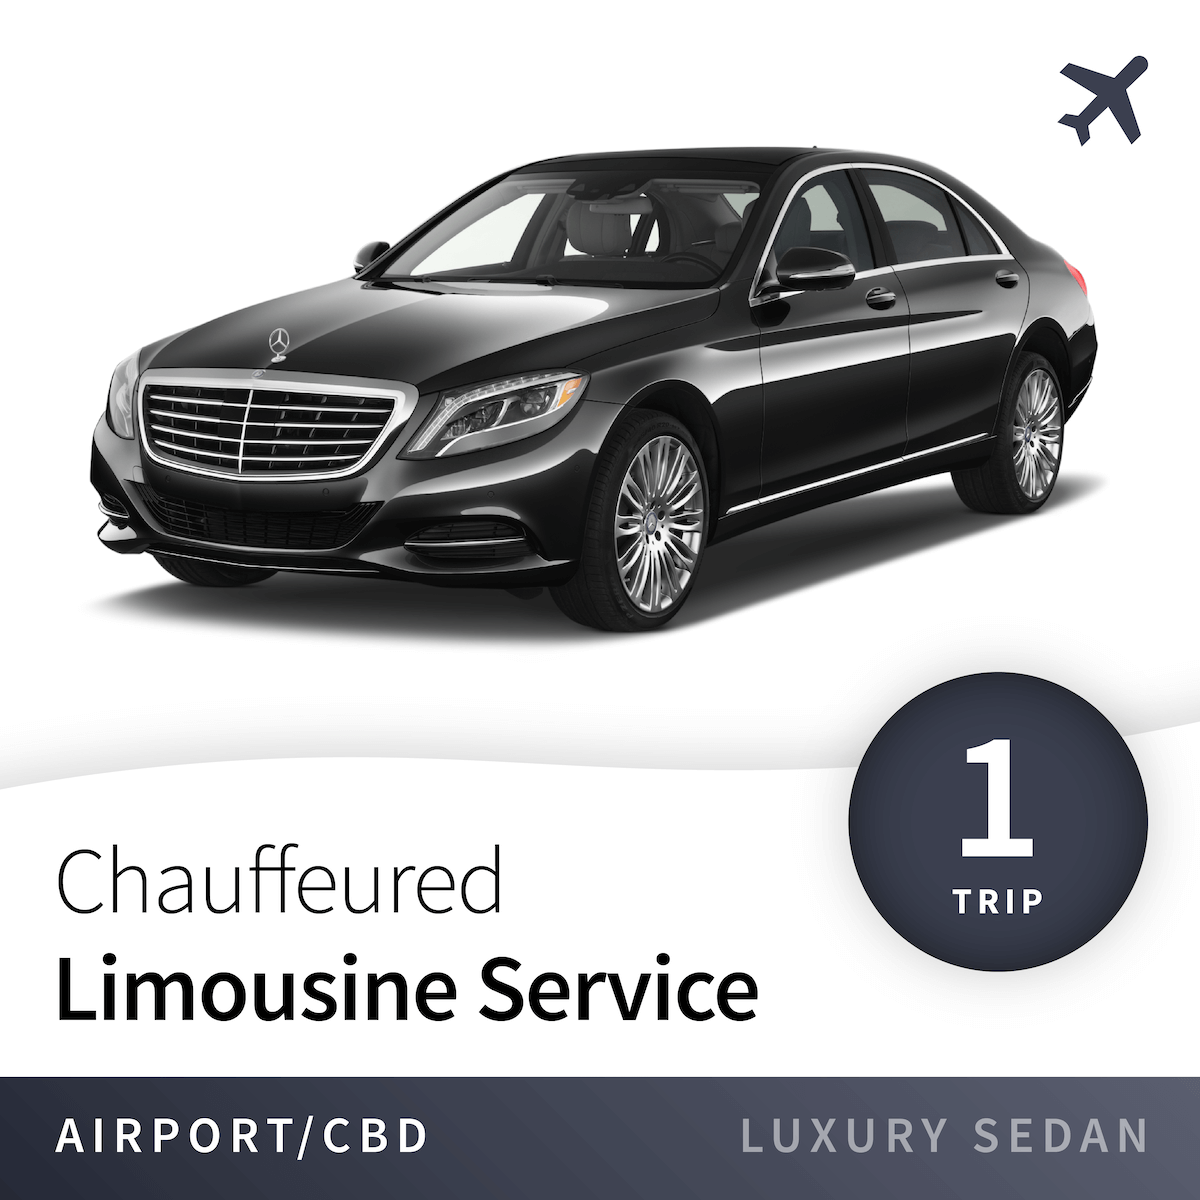 Chauffeured Limousine Service - Airport - Luxury Sedan (1 Trip) 8